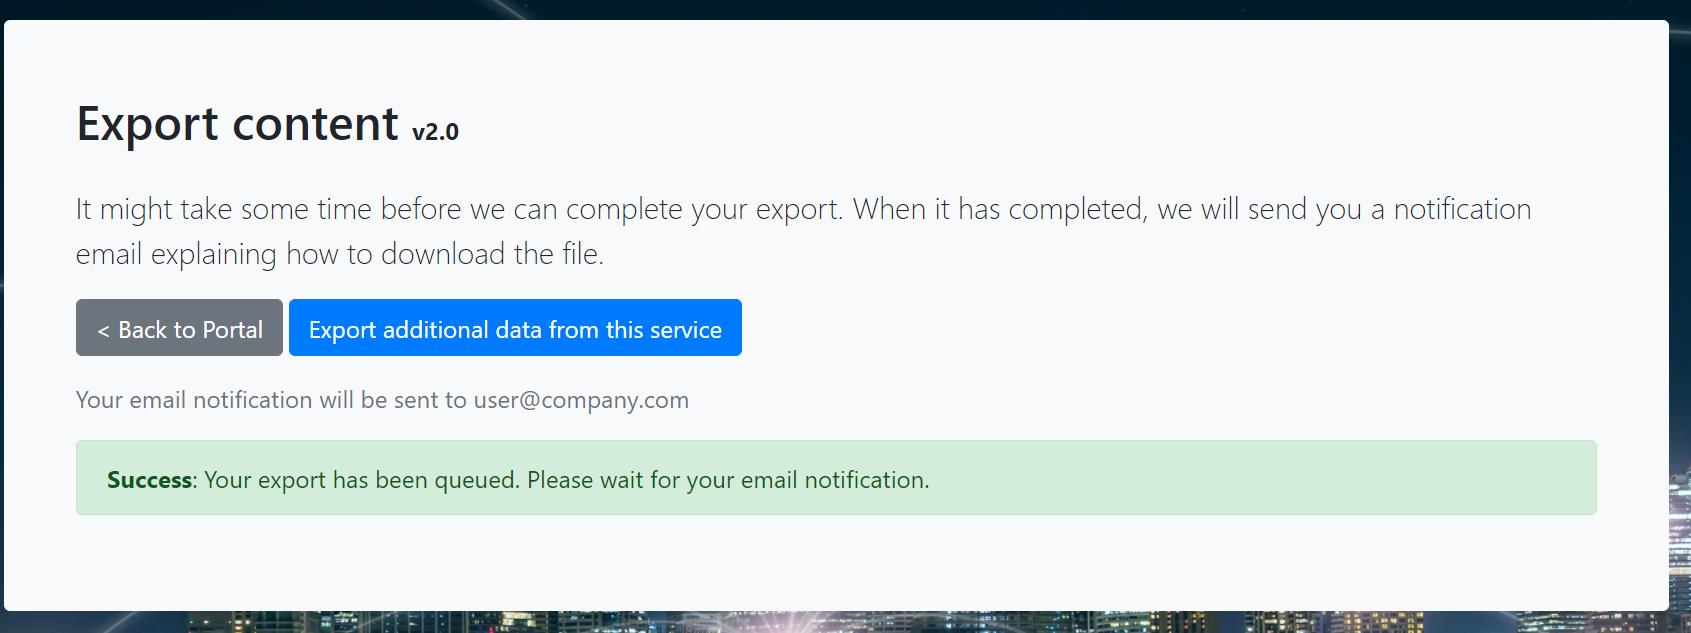 Confirmation Screen